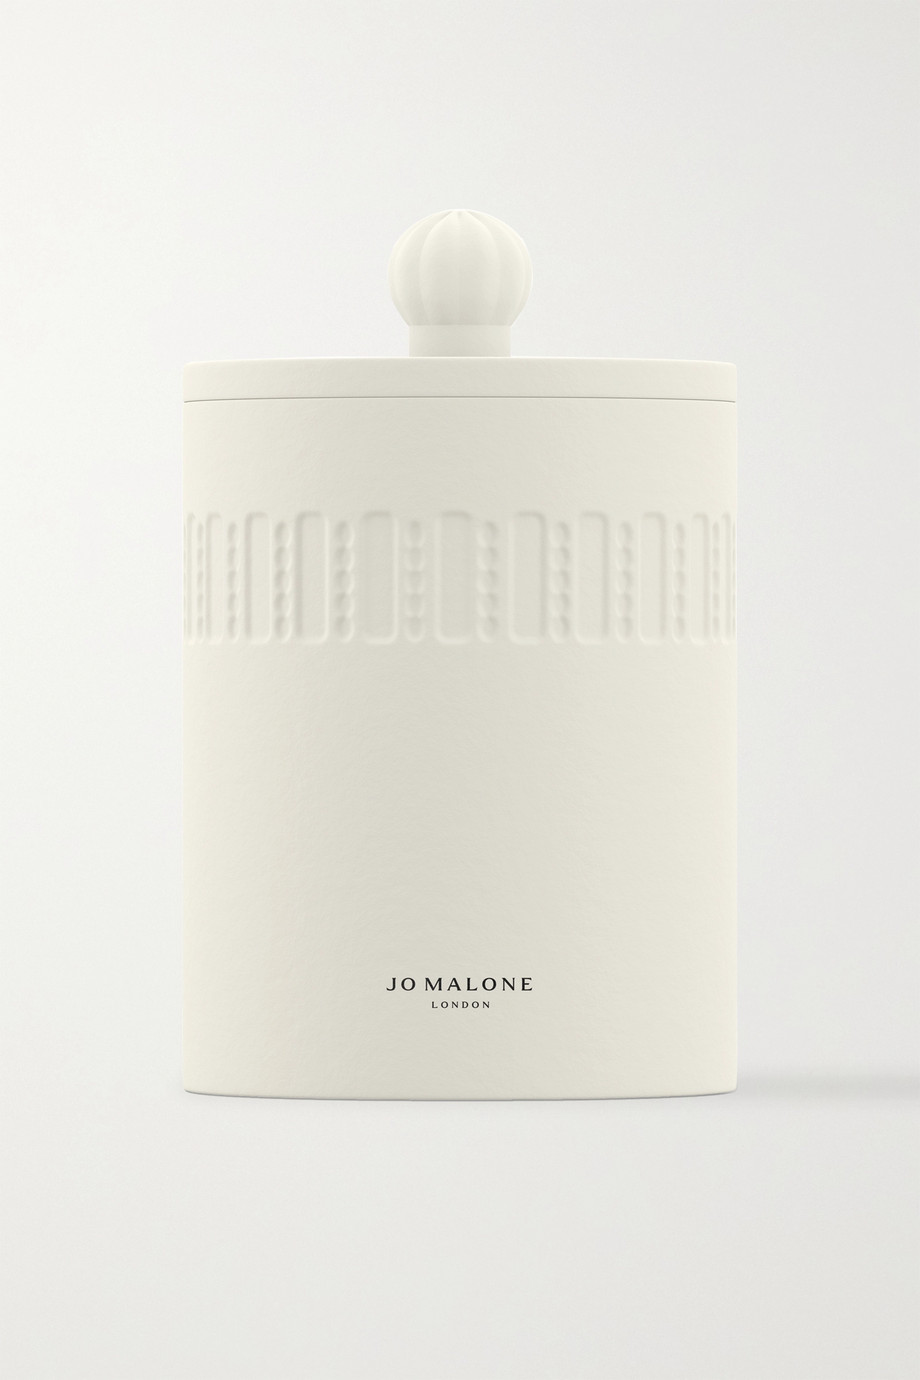 Jo Malone London Green Tomato Vine Scented Candle, 300g